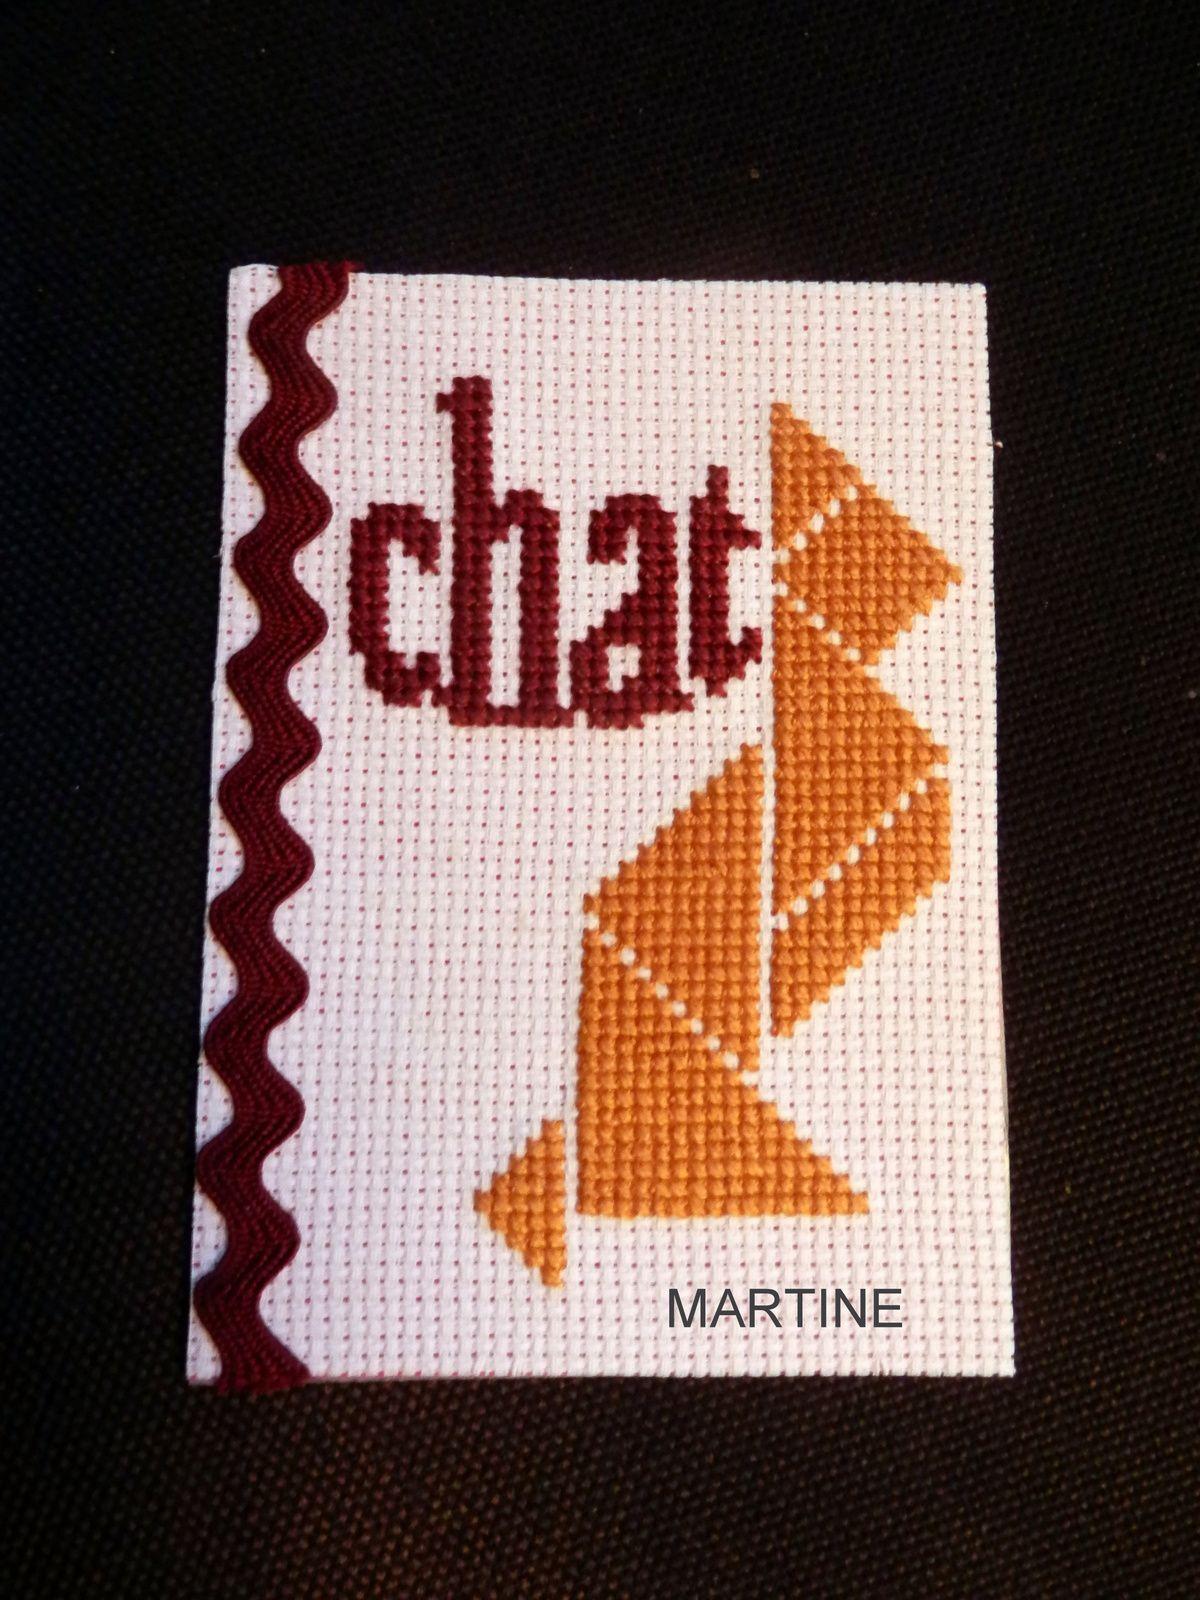 ET VOICI LA  3EME ATC RECUE DE MARTINE AU 1ER JUIN 2021